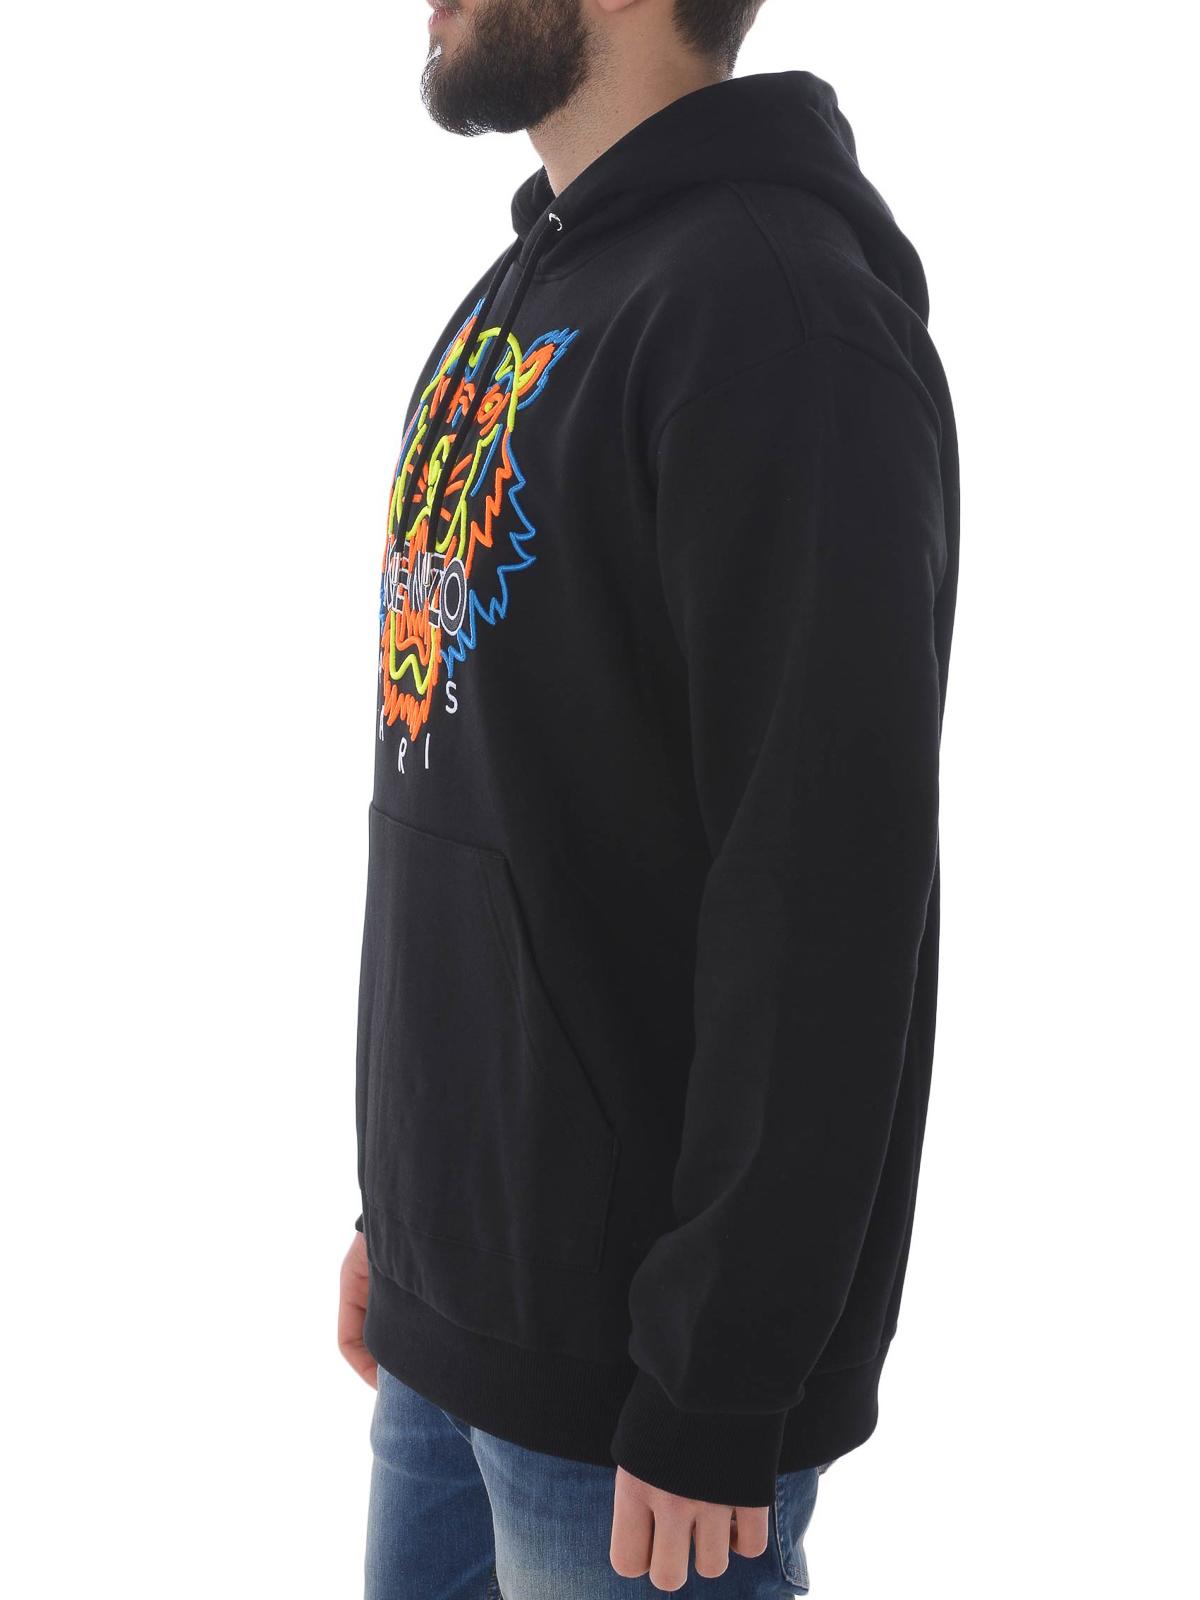 bdfb5942 Kenzo - Tiger multicolour embroidery cotton hoodie - Sweatshirts ...